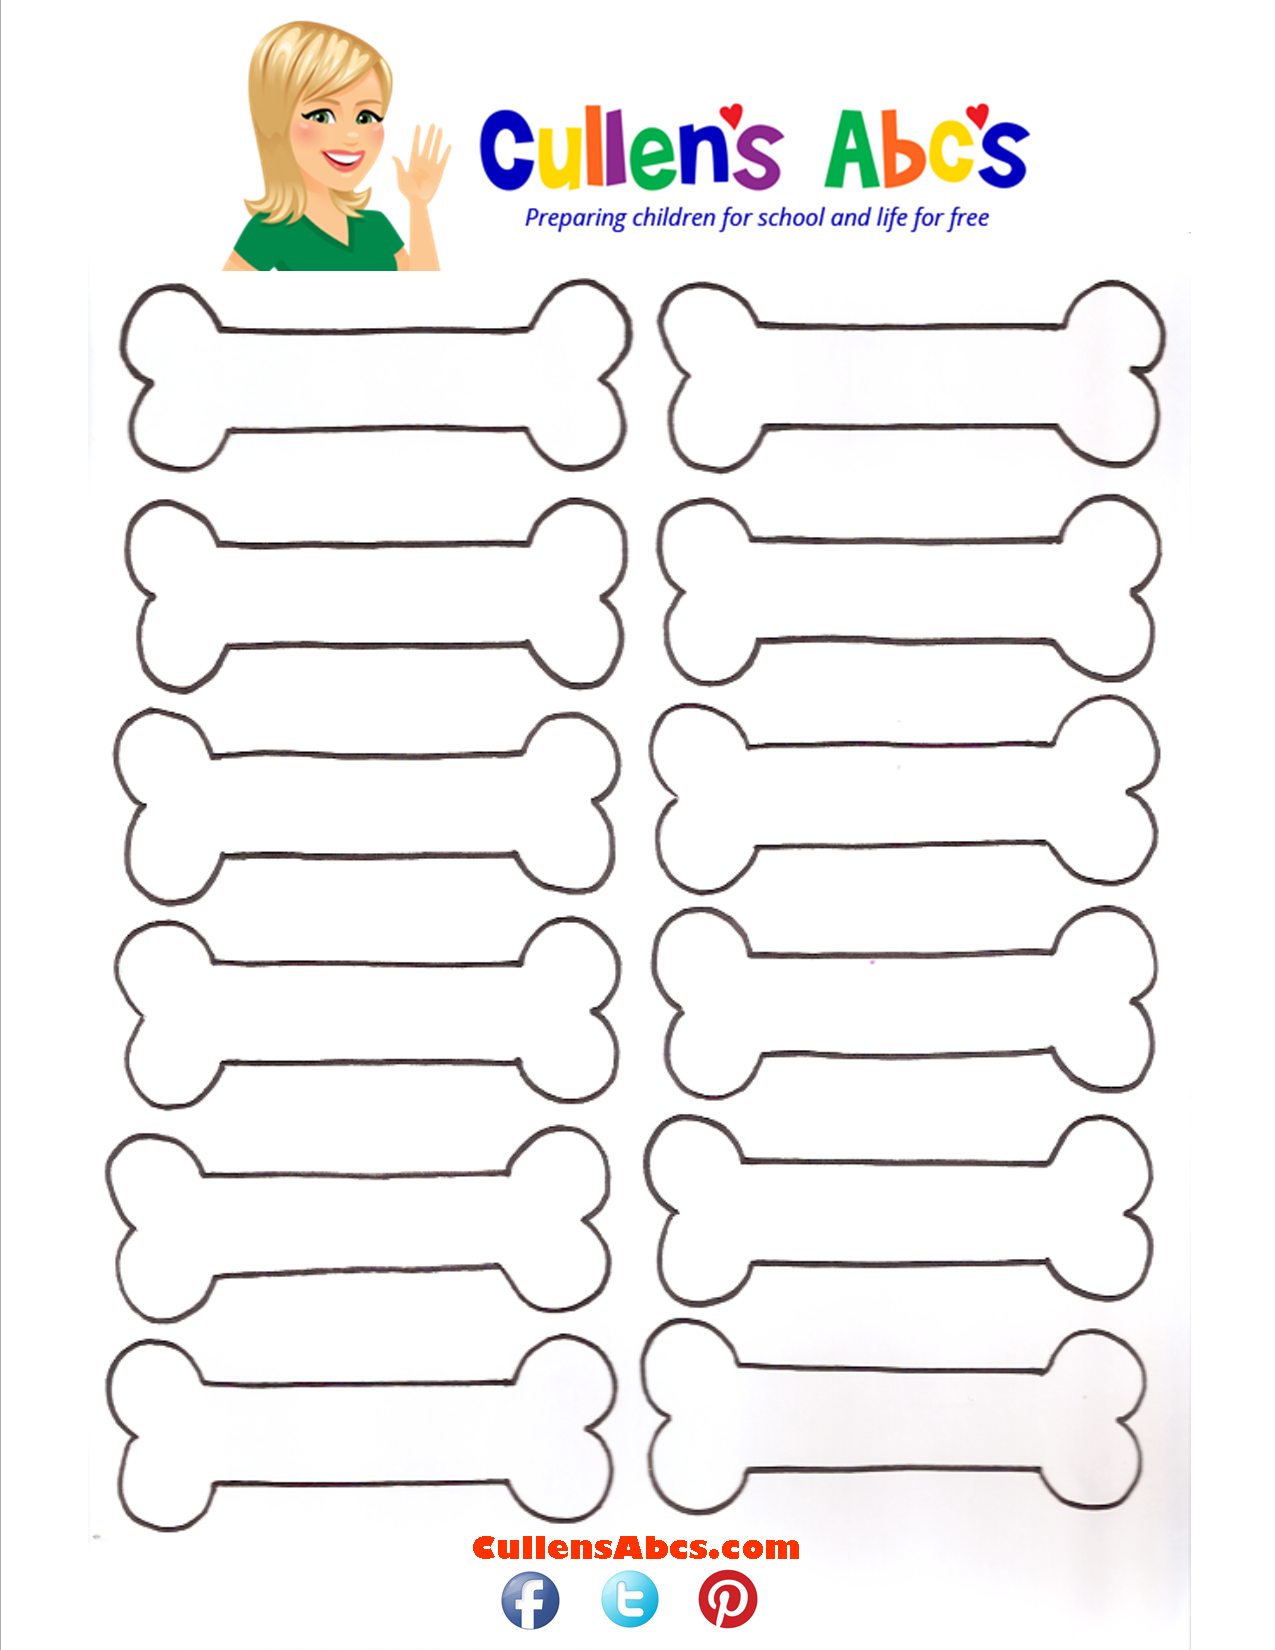 Dog Bone Pattern and game http://cullensabcs.com/patterns/dog-bone ...